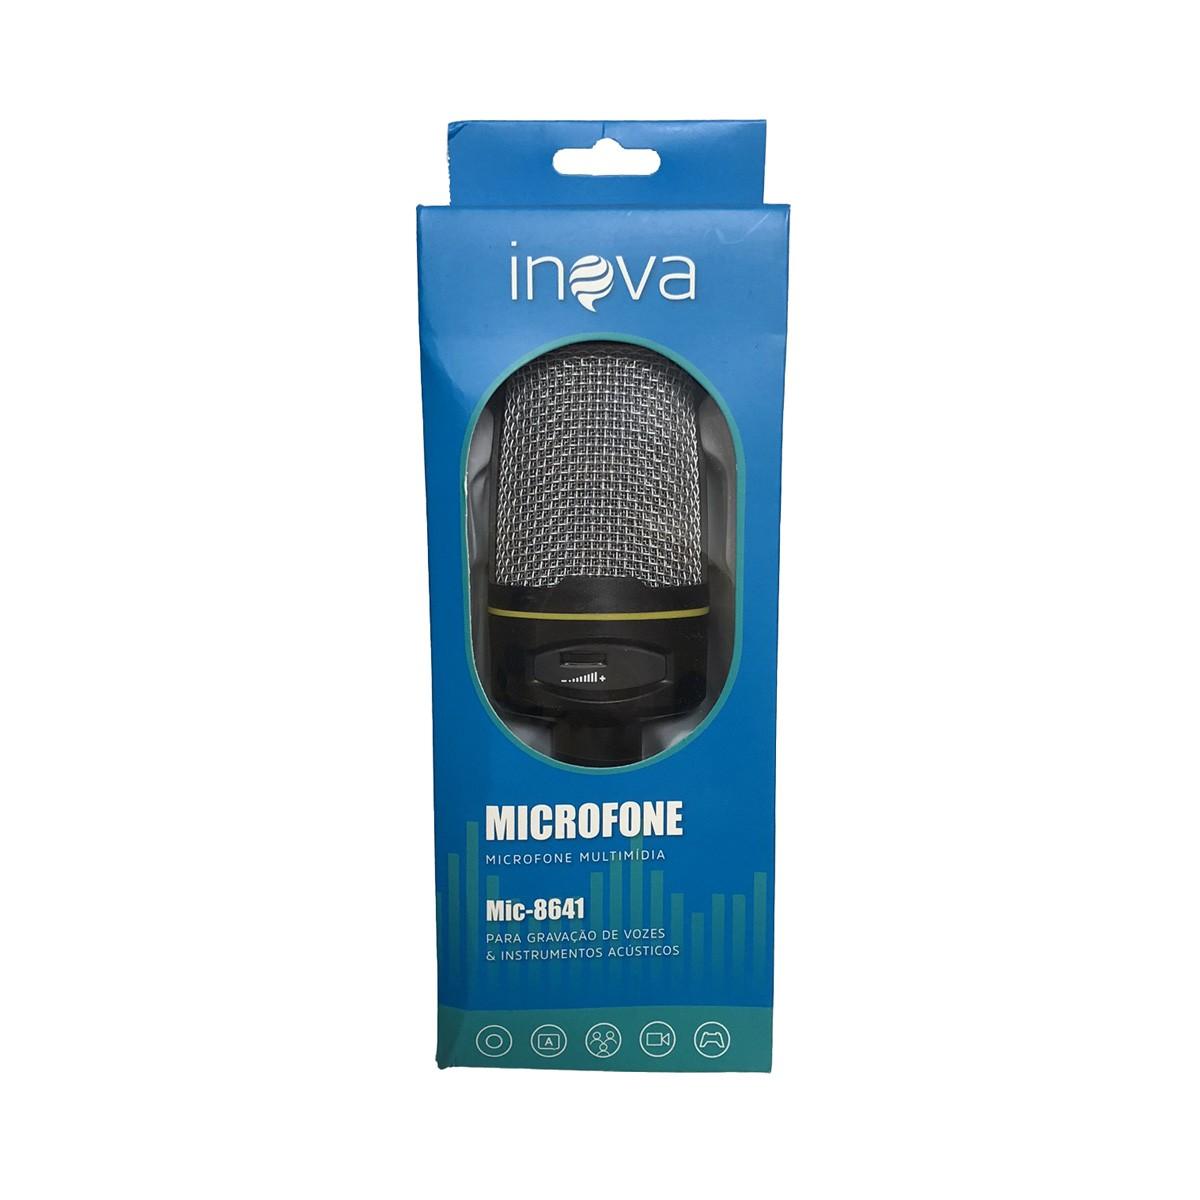 Microfone Multimídia Condensador Youtuber Mic-8641 Inova